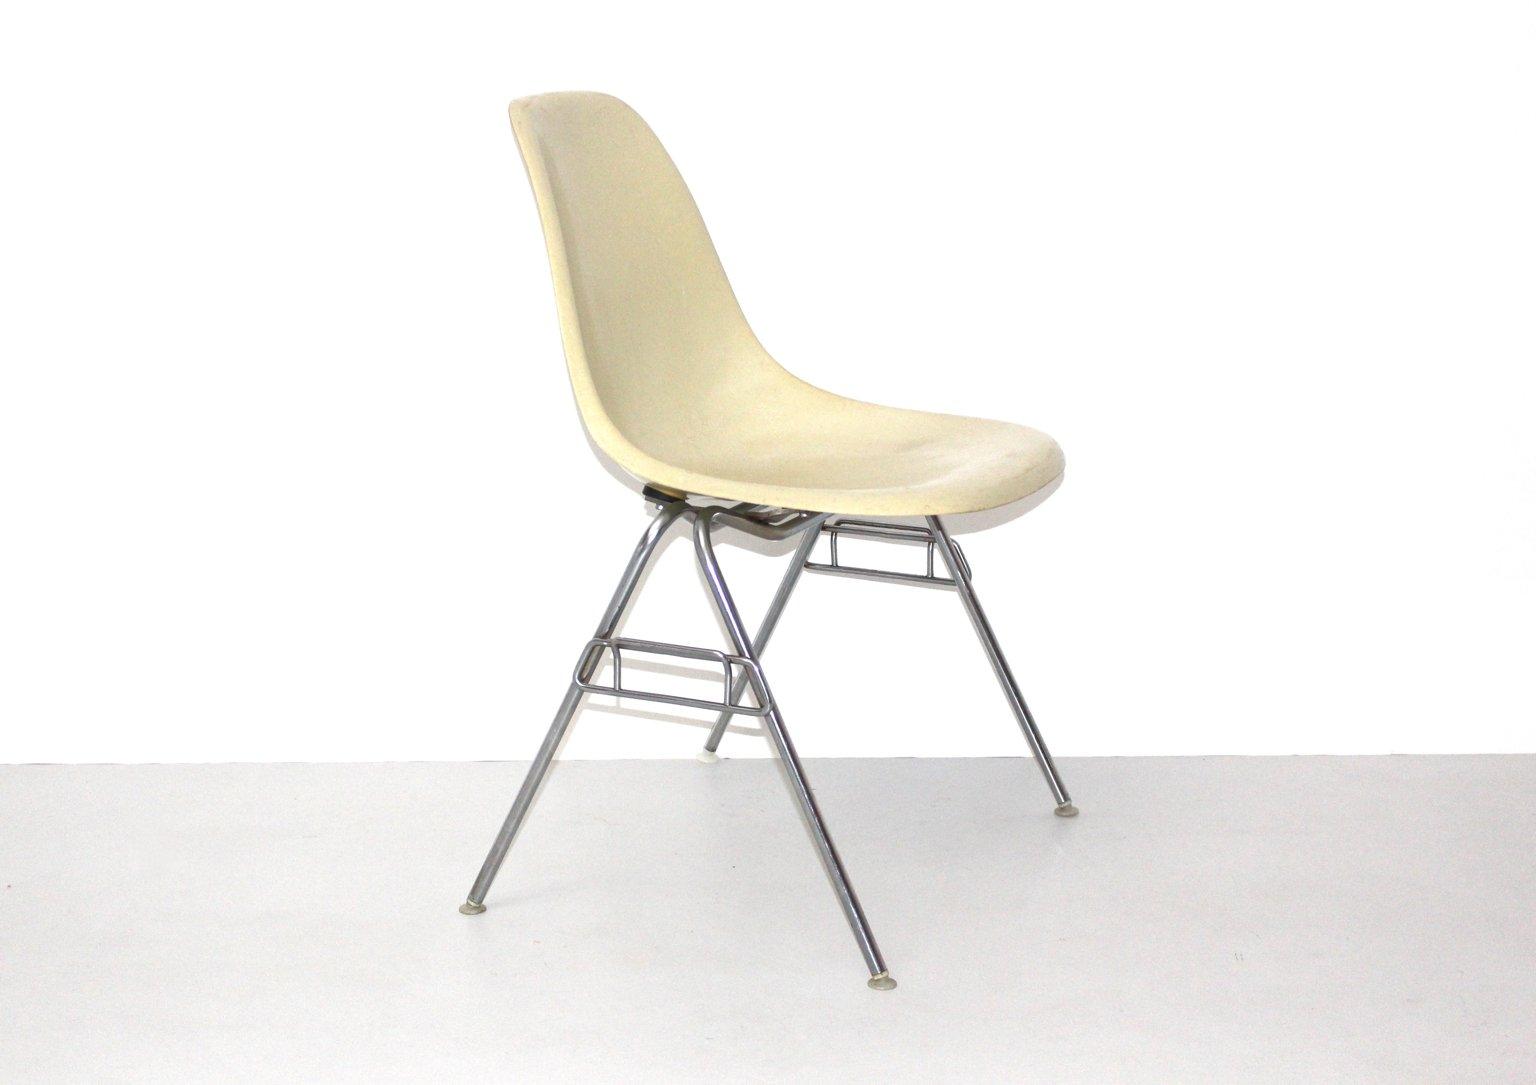 vintage model dss n fiberglas stuhl von ray charles eames fr herman miller - Herman Miller Schreibtischsthle